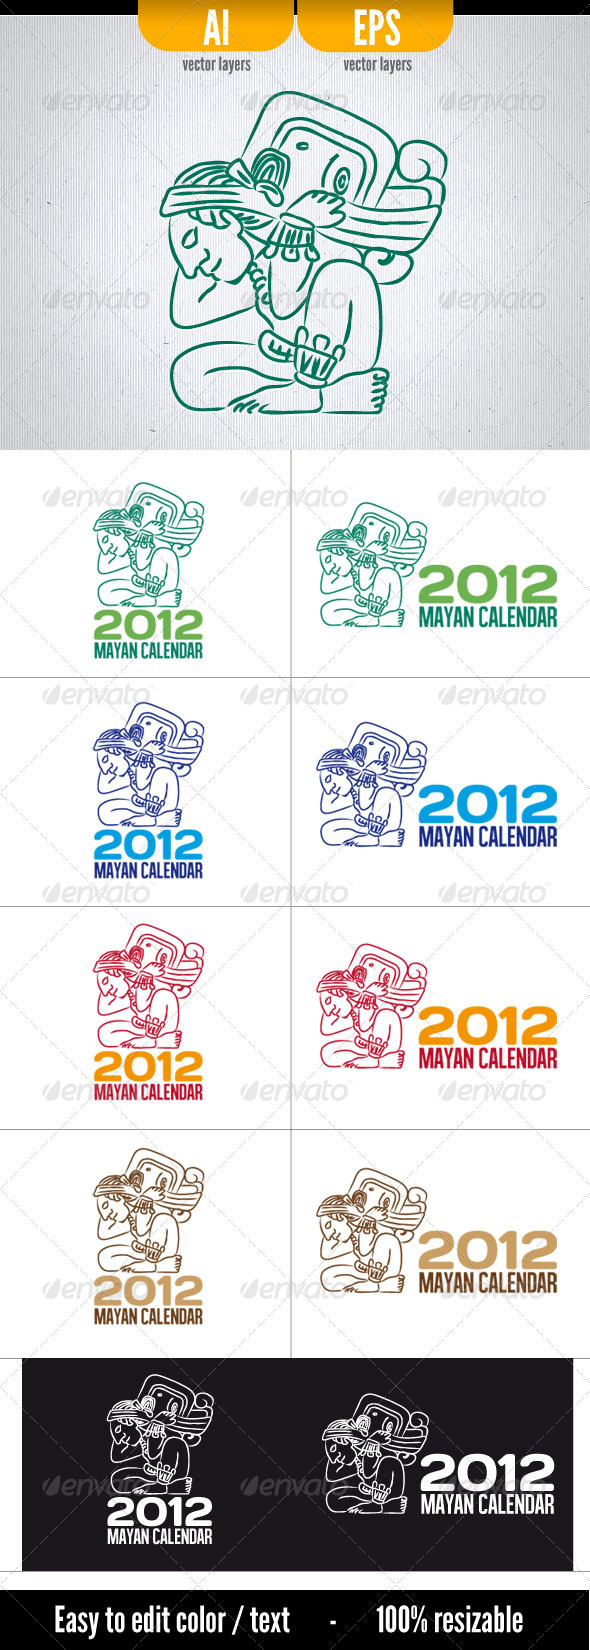 GraphicRiver 2012 Mayan Calendar 2704194